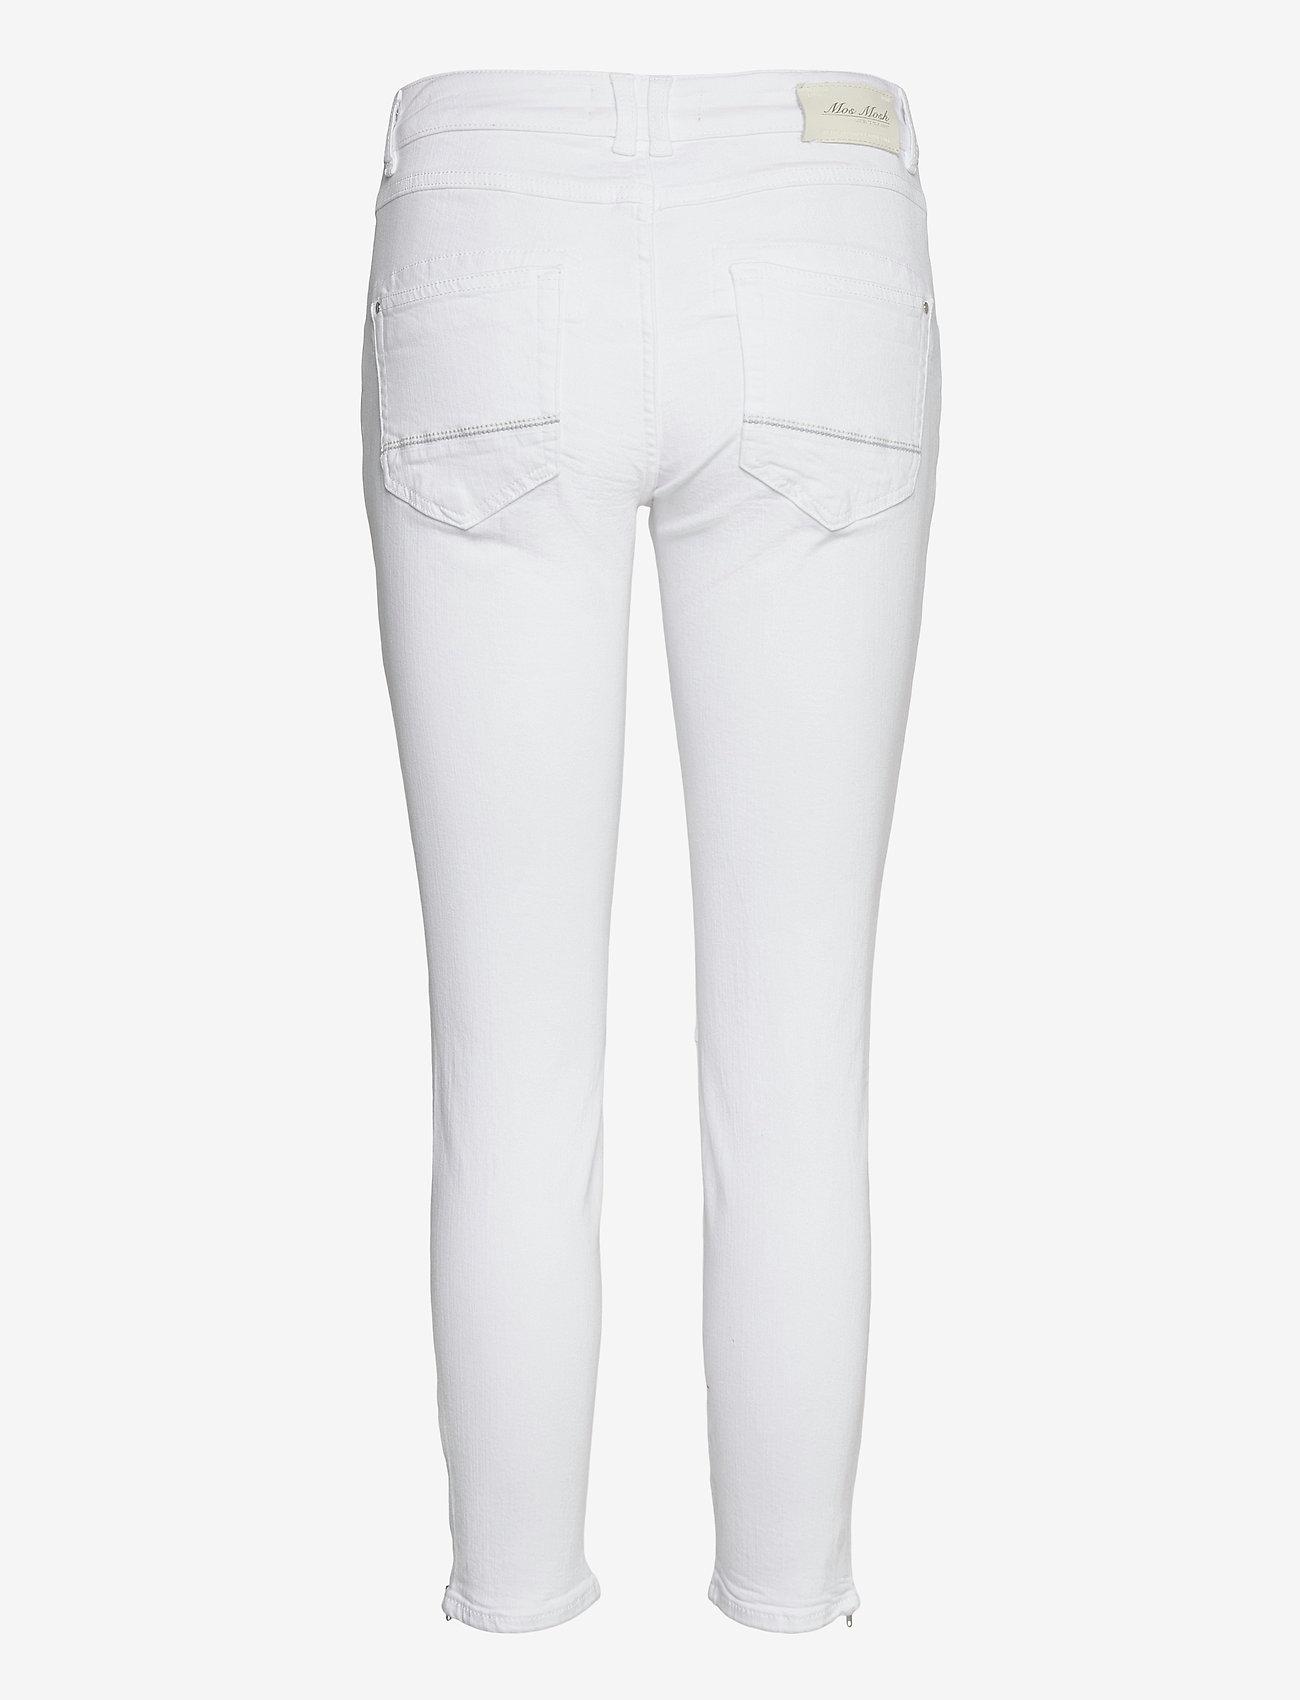 MOS MOSH - Naomi Shade White Jeans - slim jeans - white - 1